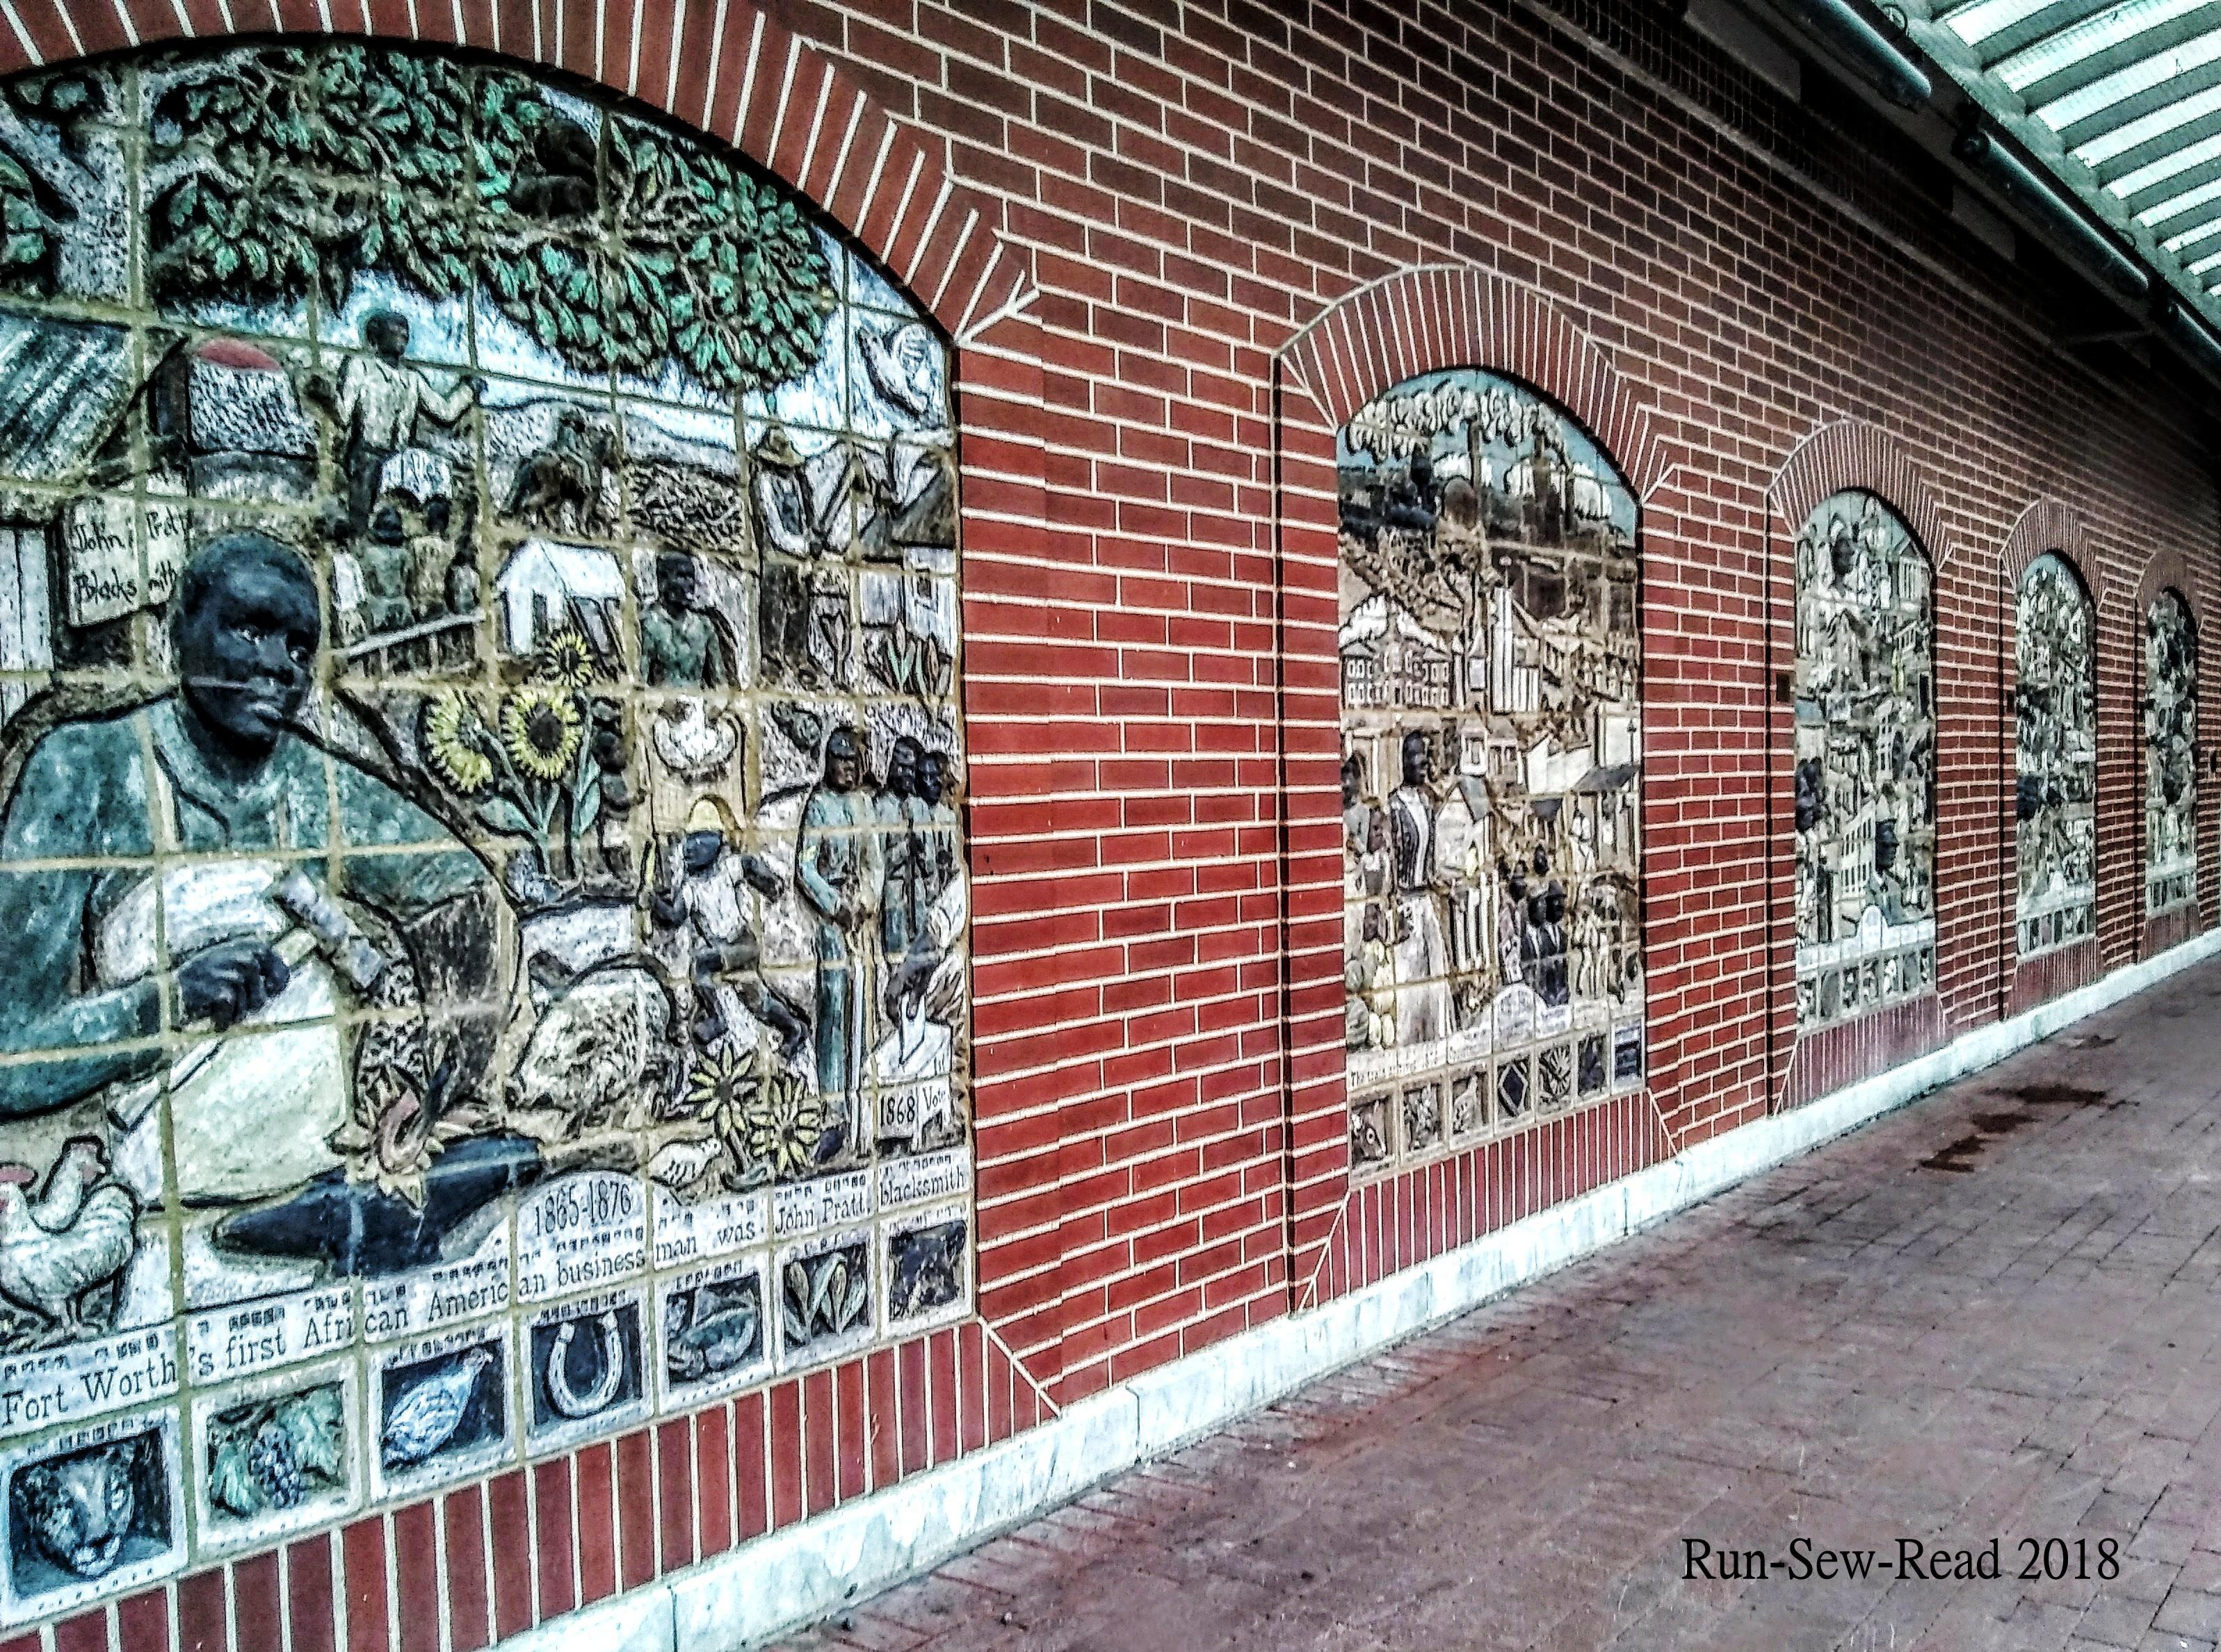 Ft Worth ITC murals